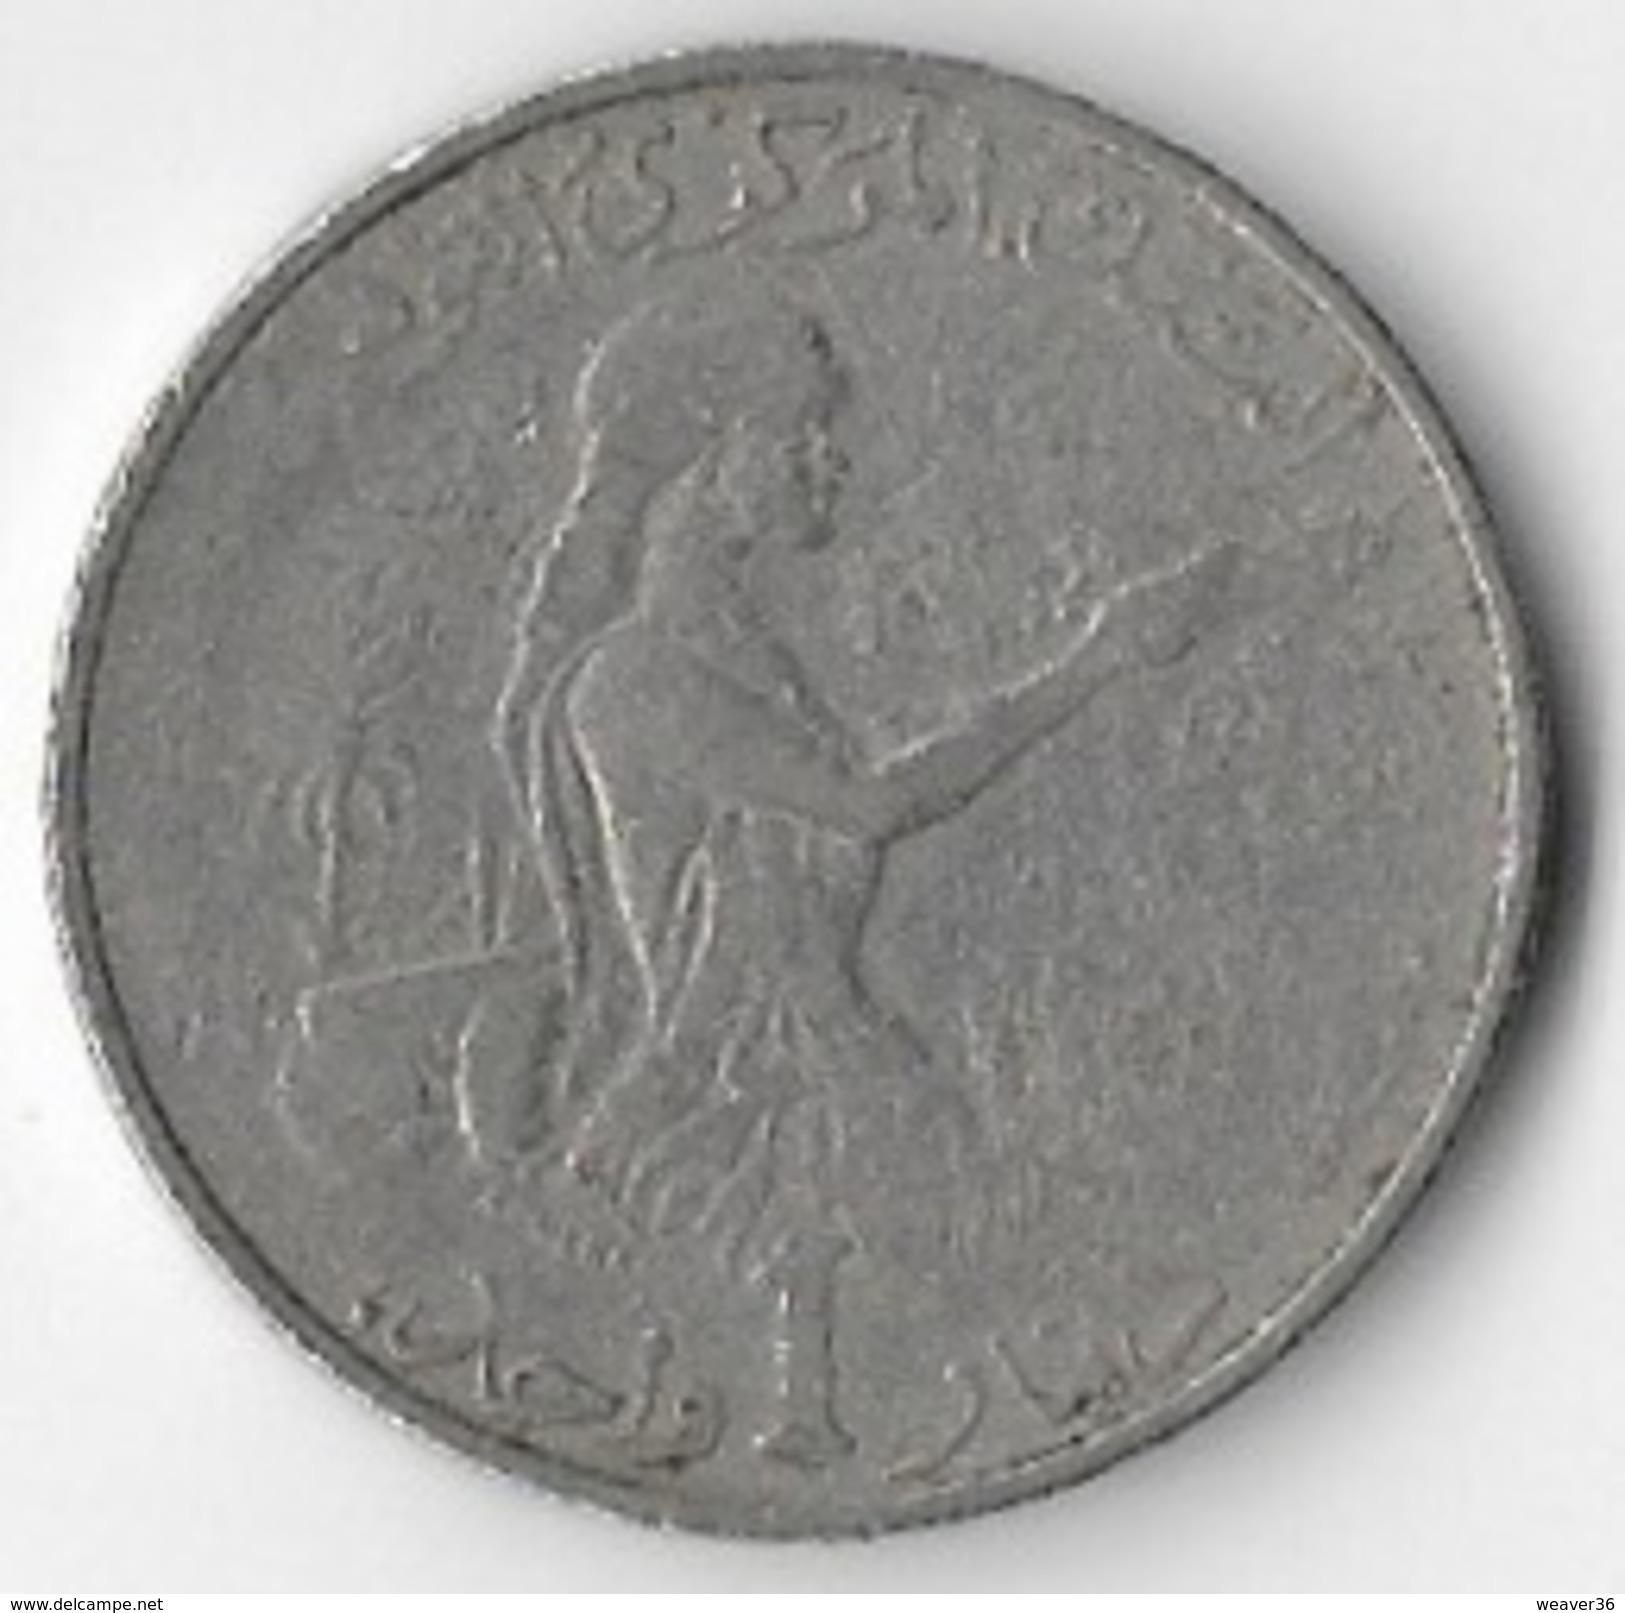 Tunisia 1976 1 Dinar [C445/2D] - Tunisia